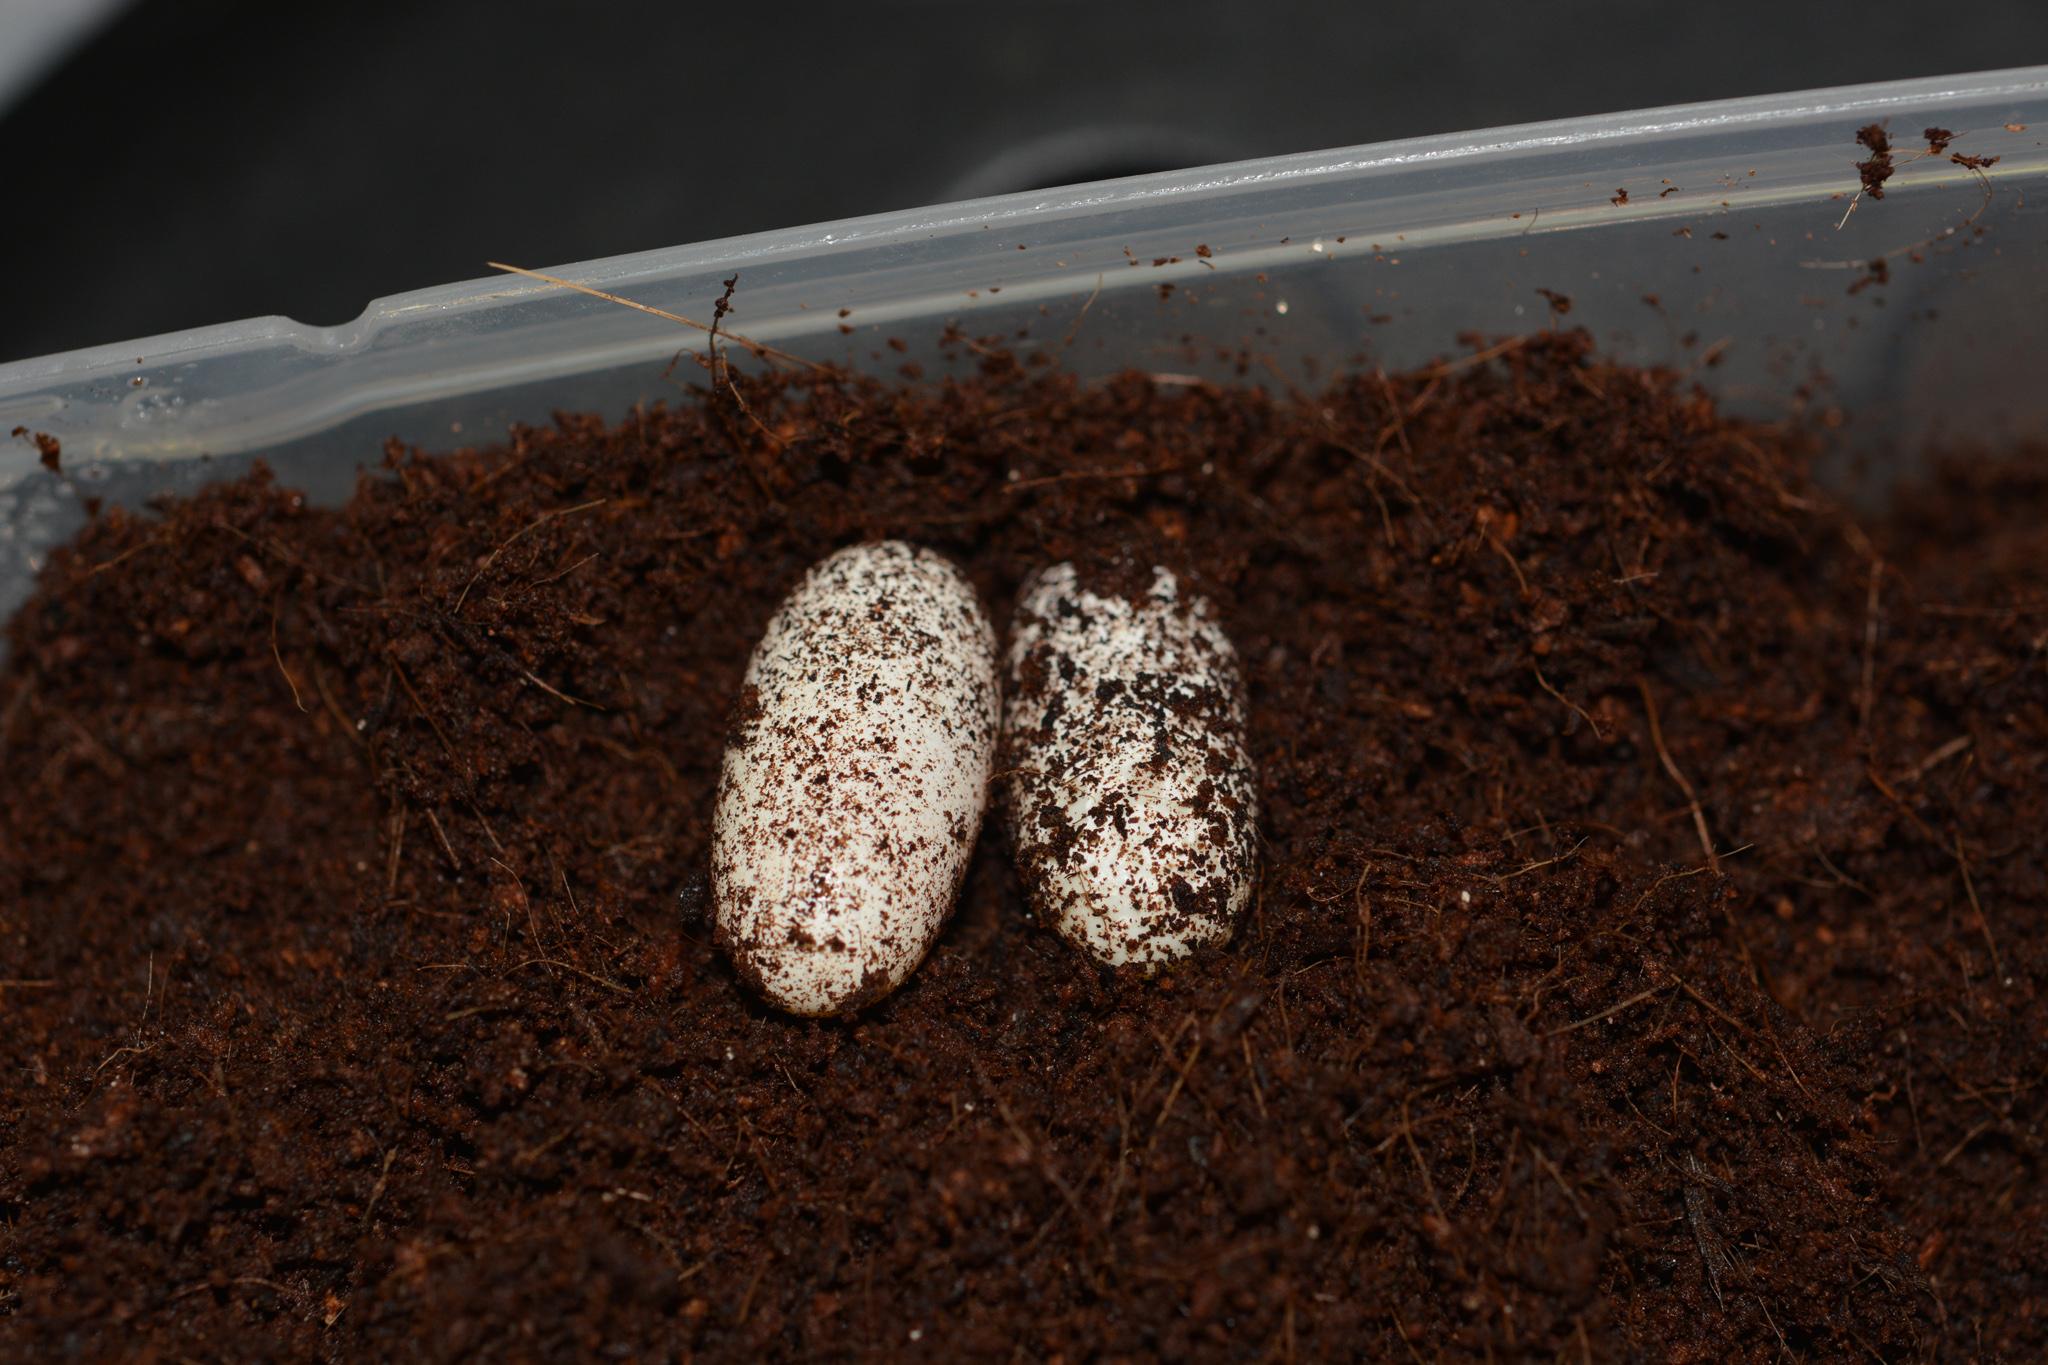 eublepharis_hardwickii_eggs02.jpg